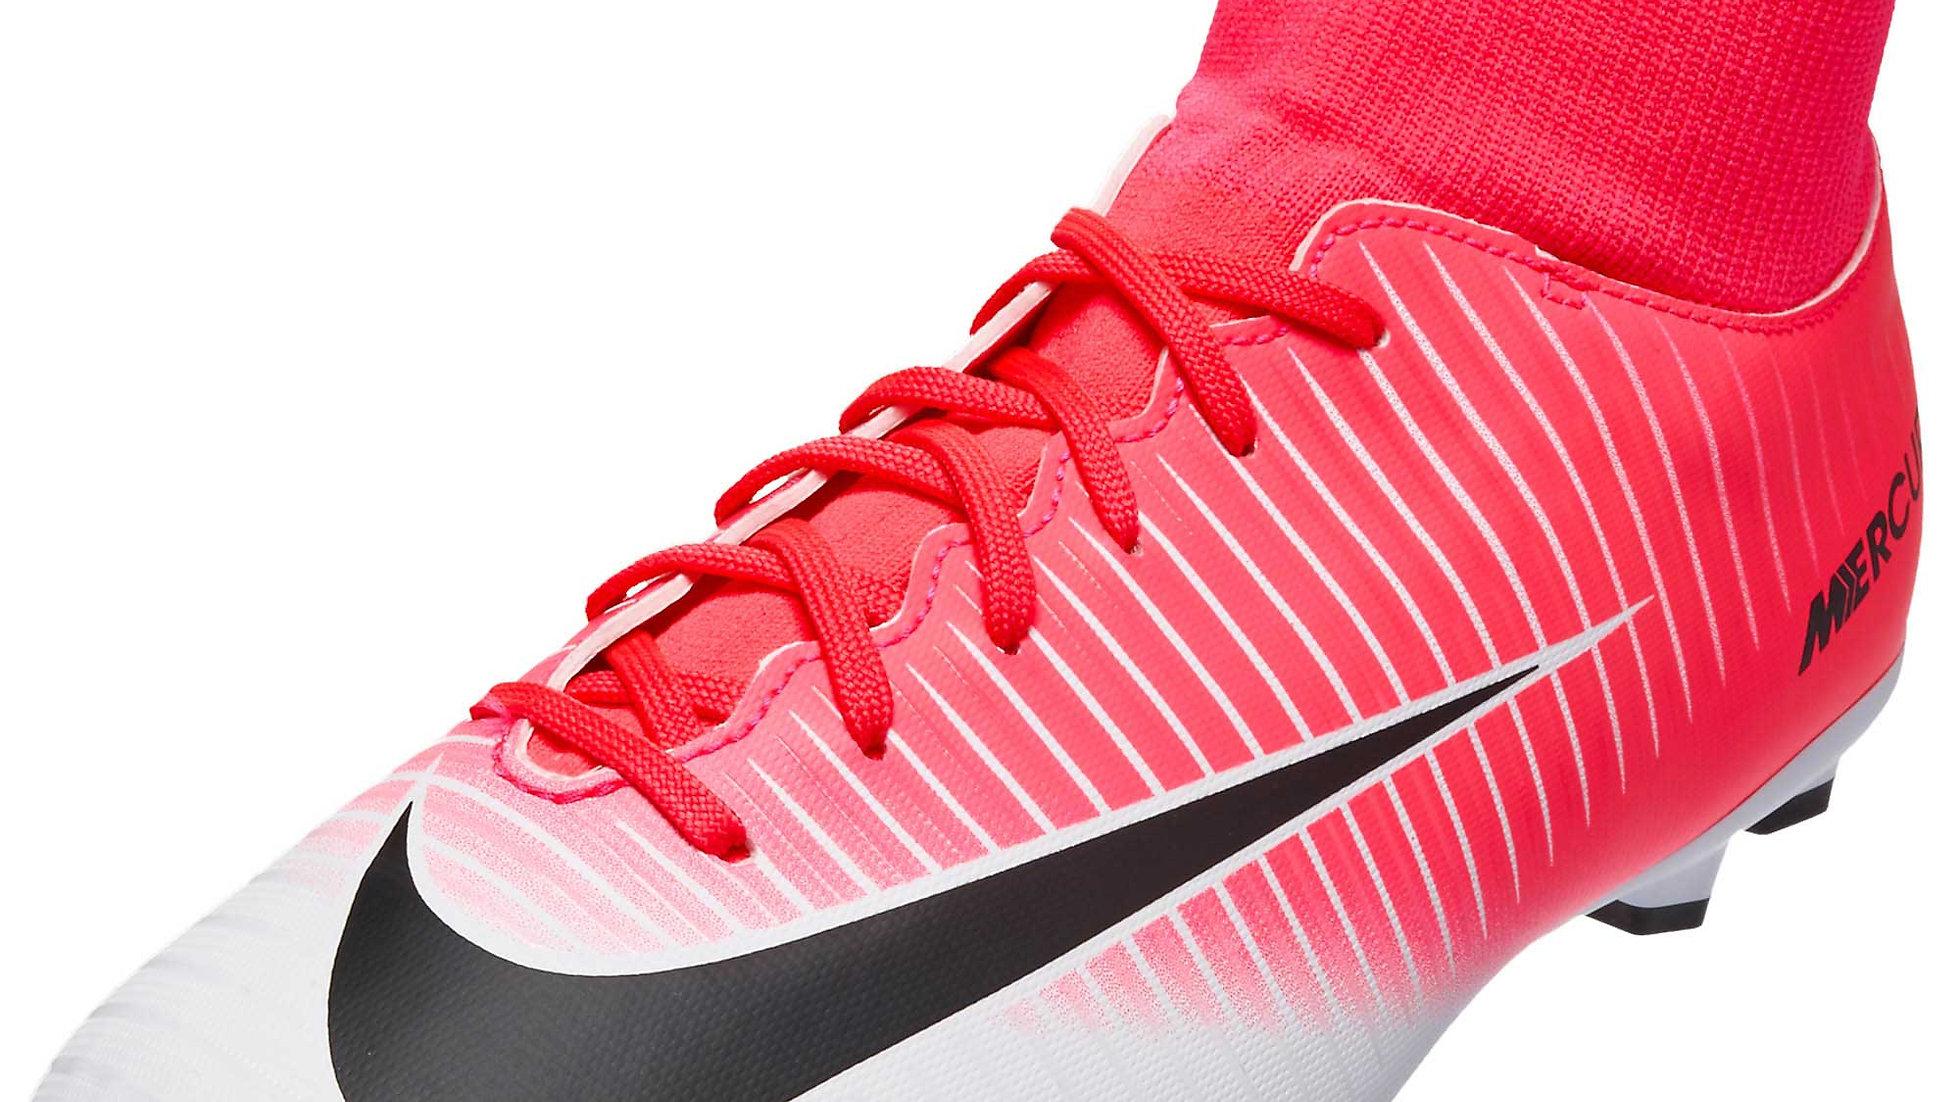 new arrival bd8db 96fc5 Nike Men's Mercurial Victory VI Soccer Cleats